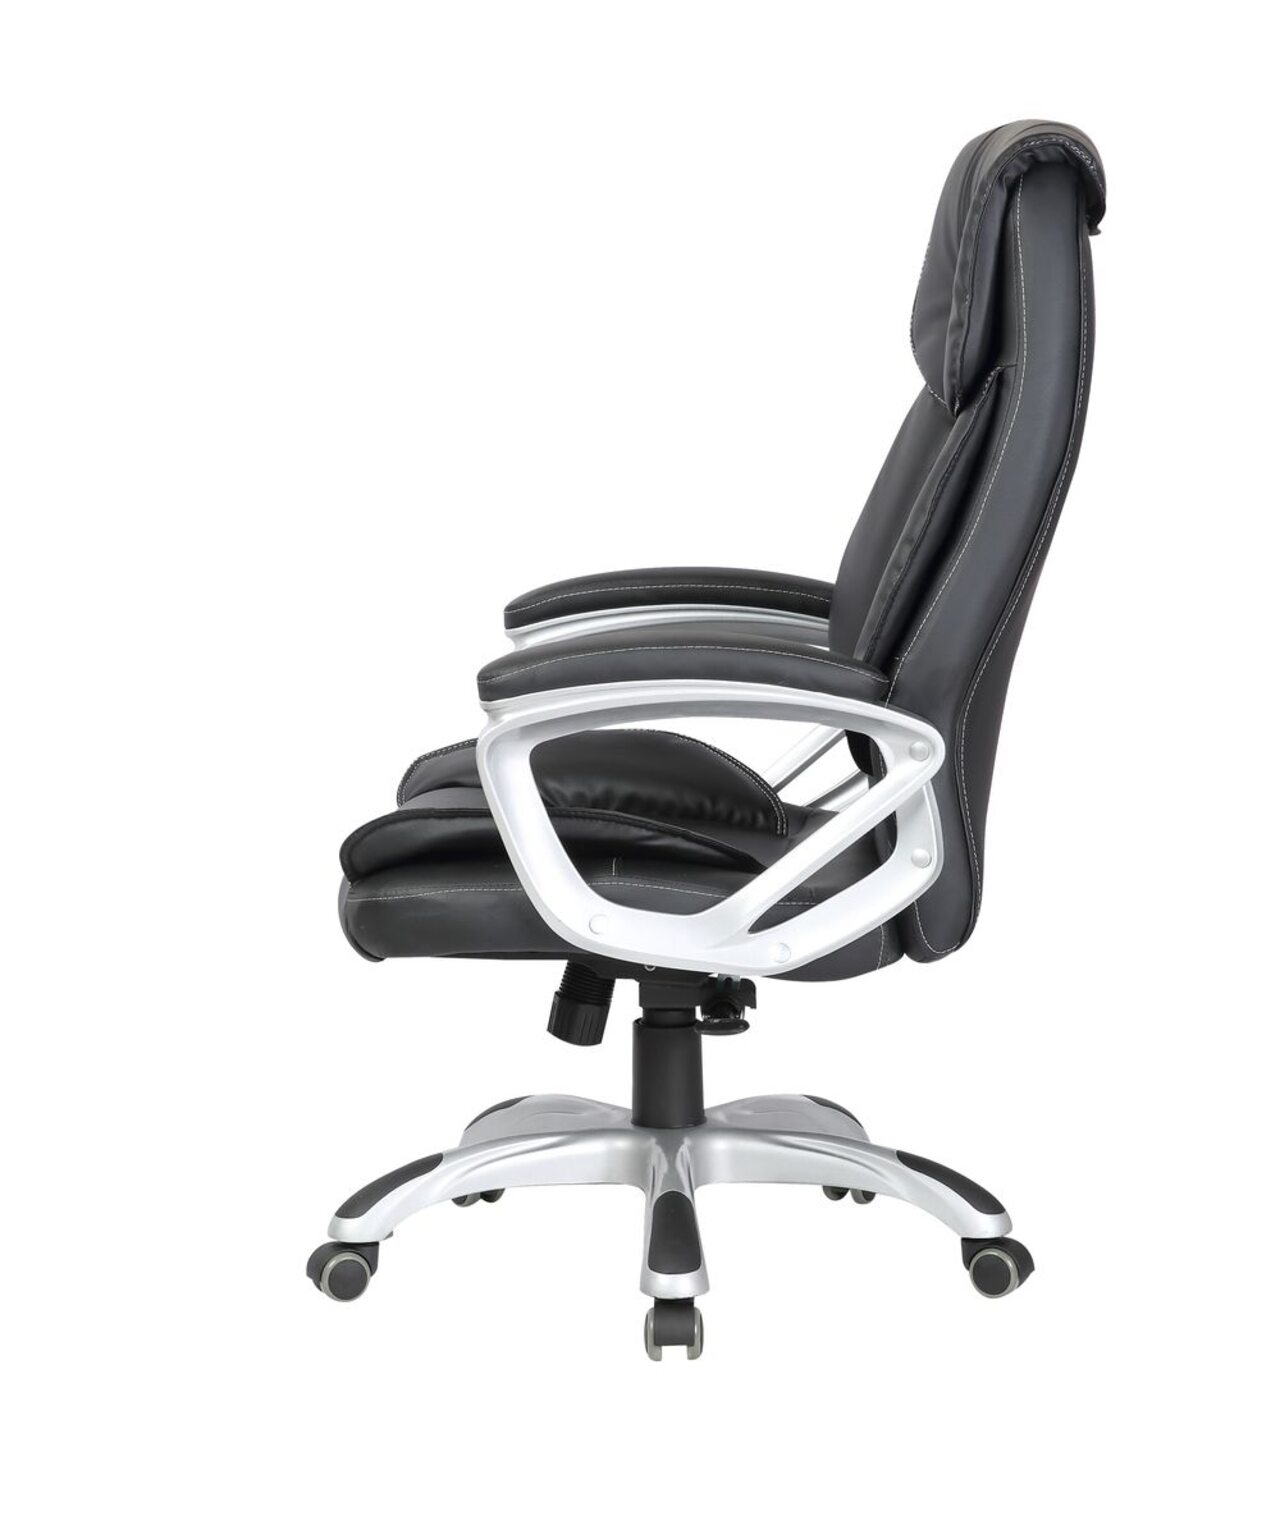 Кресло руководителя College CLG-615 LXH - фото 6